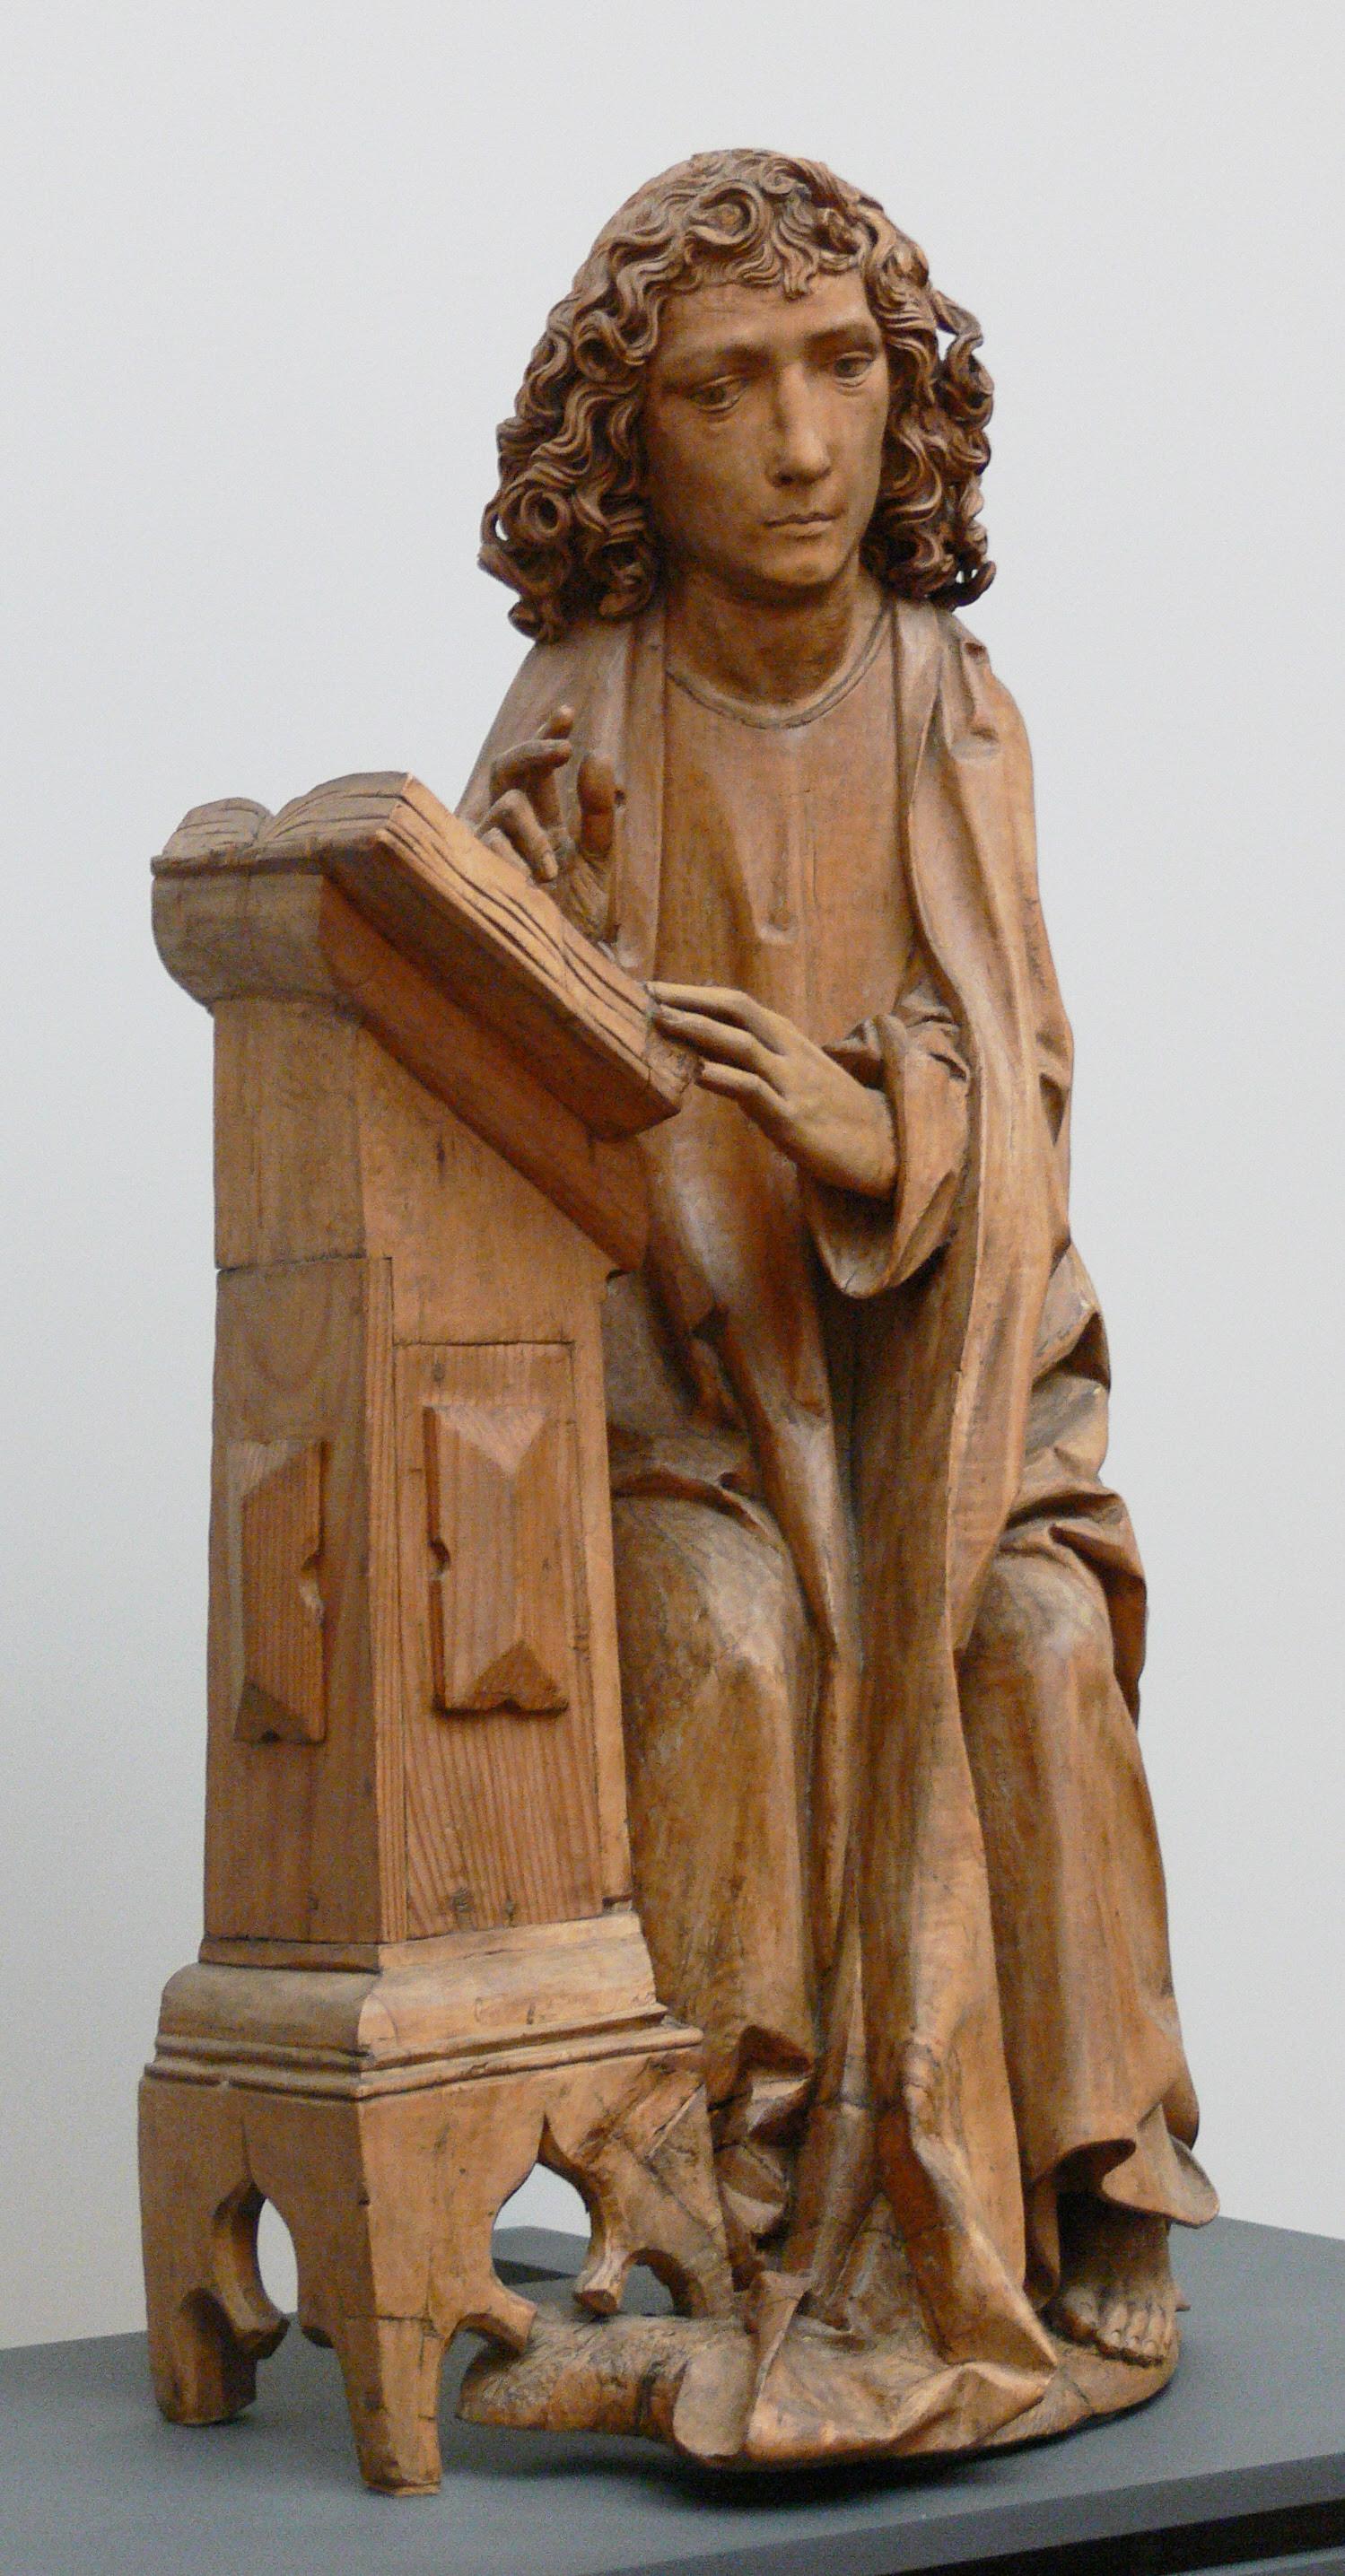 http://upload.wikimedia.org/wikipedia/commons/5/50/Riemenschneider_Evangelisten_Johannes.jpg